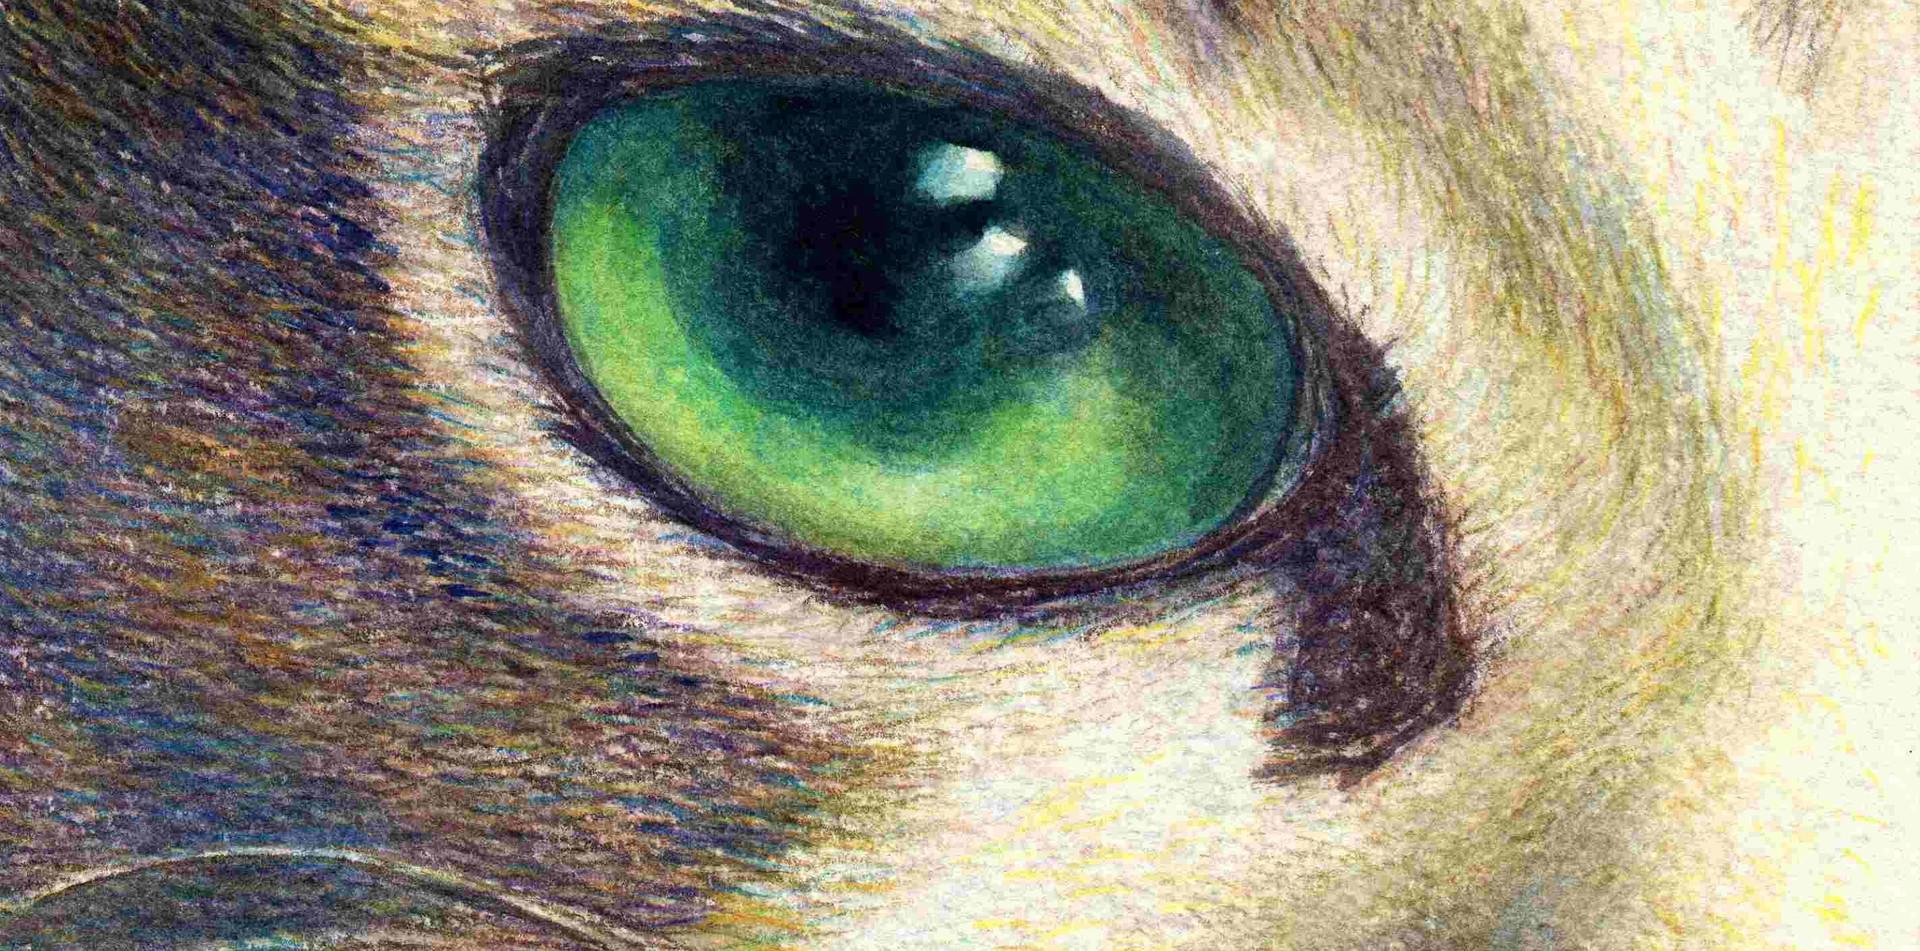 504 - The Eye